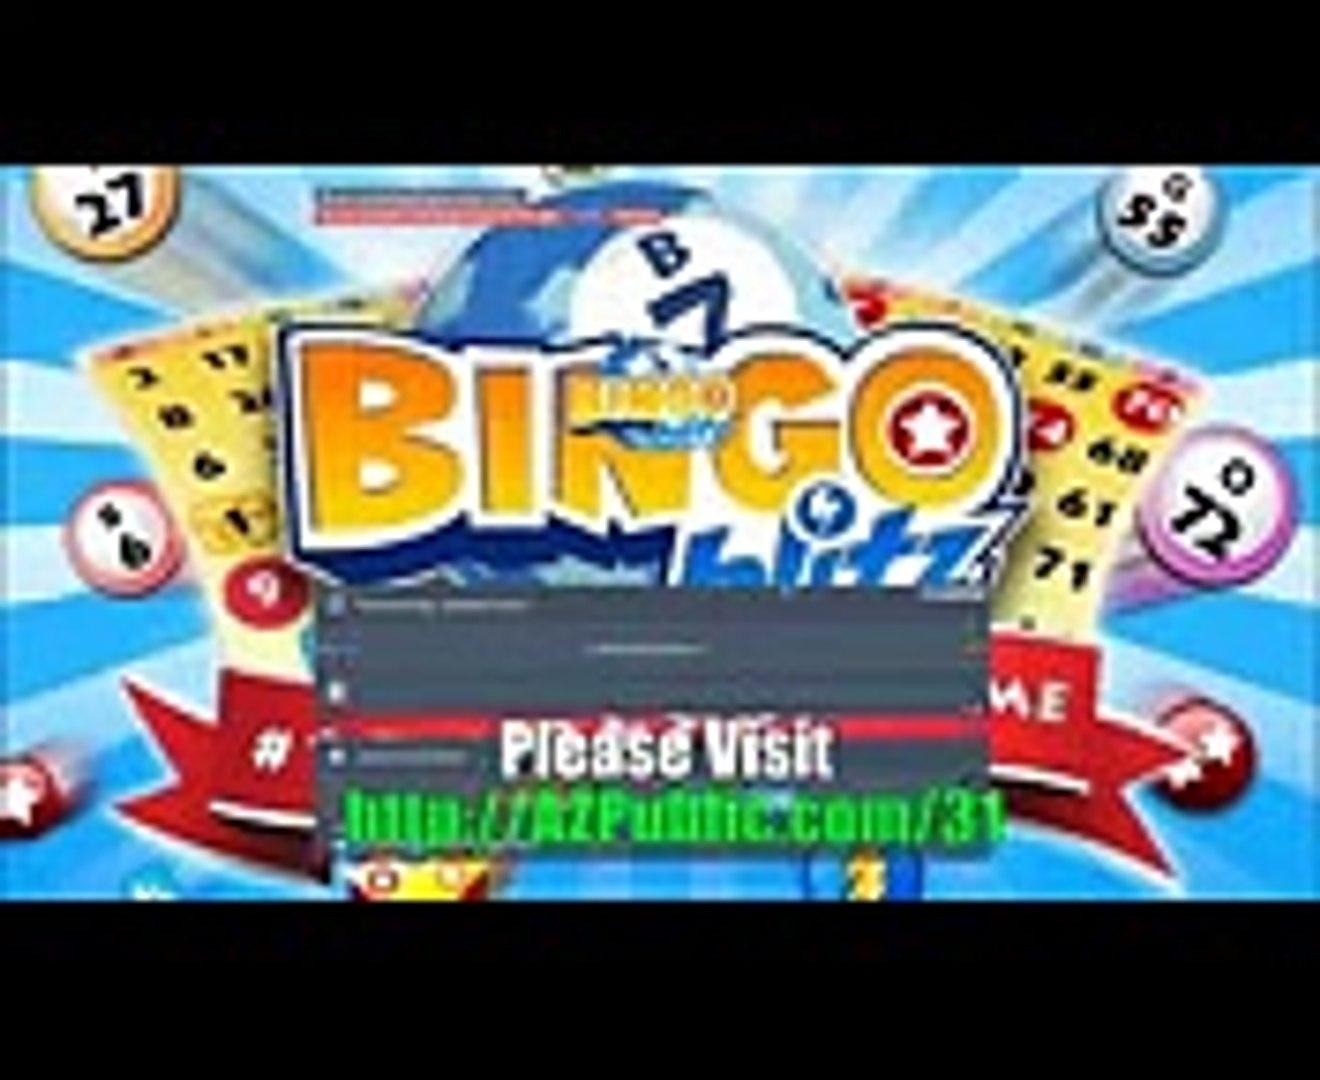 Bingo Blitz Hack Download Free